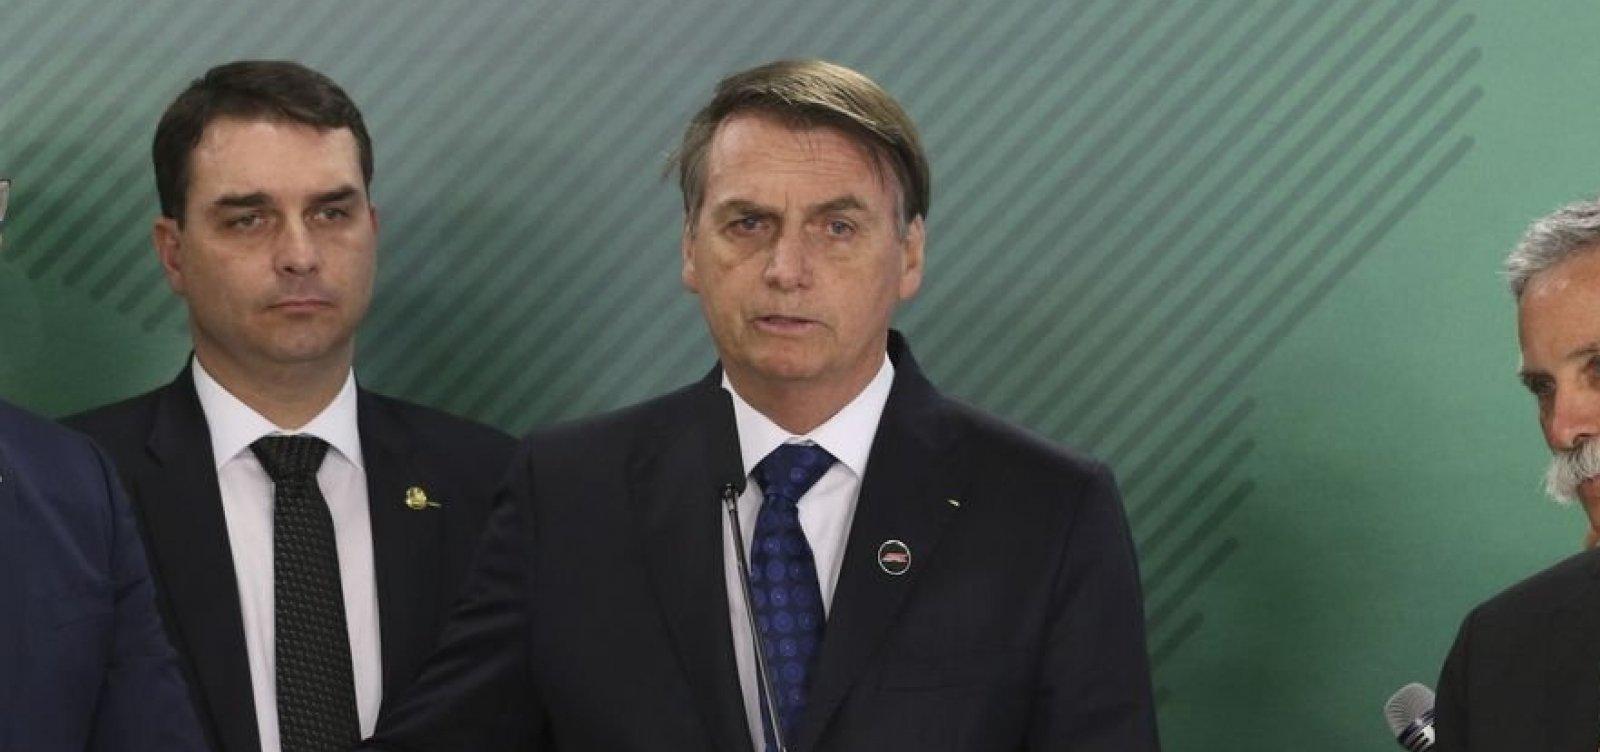 [Após revogar decreto sobre armas, Bolsonaro edita nova versão]